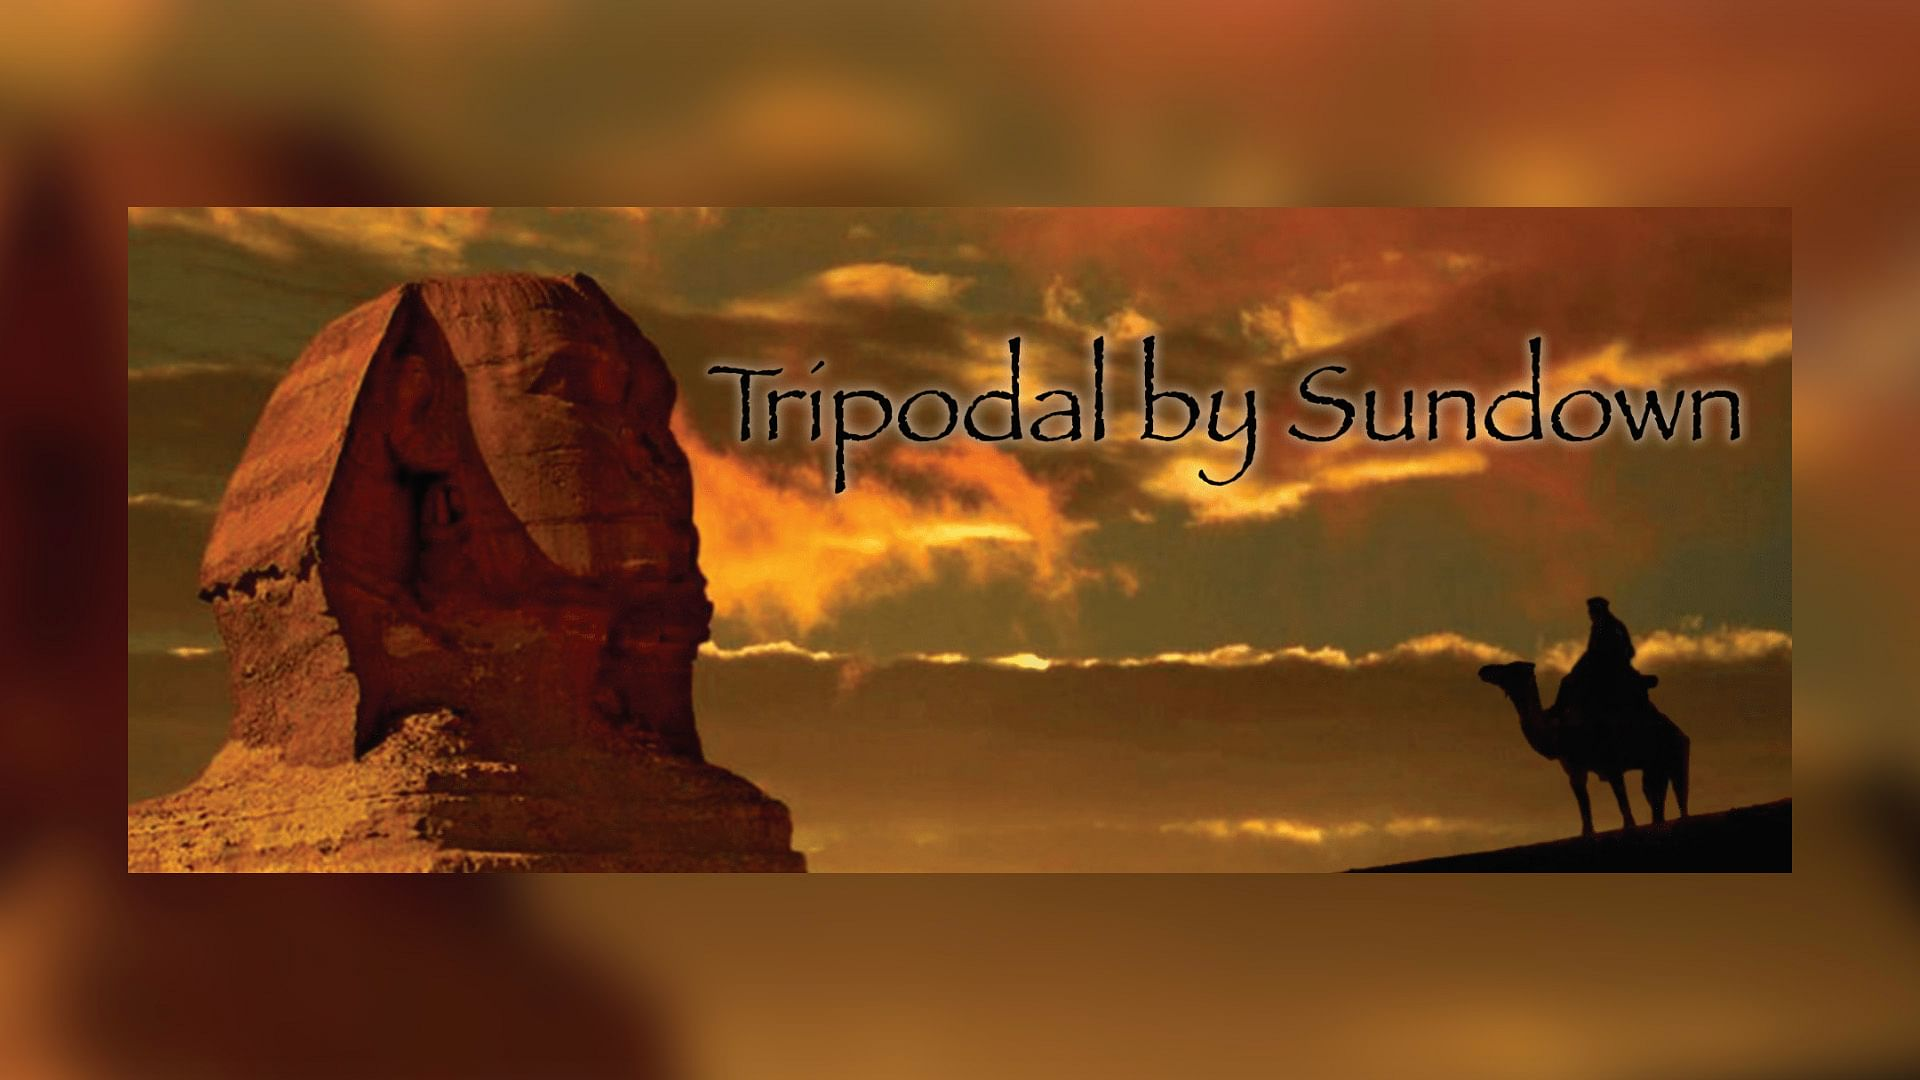 Tripodal by Sundown - magic